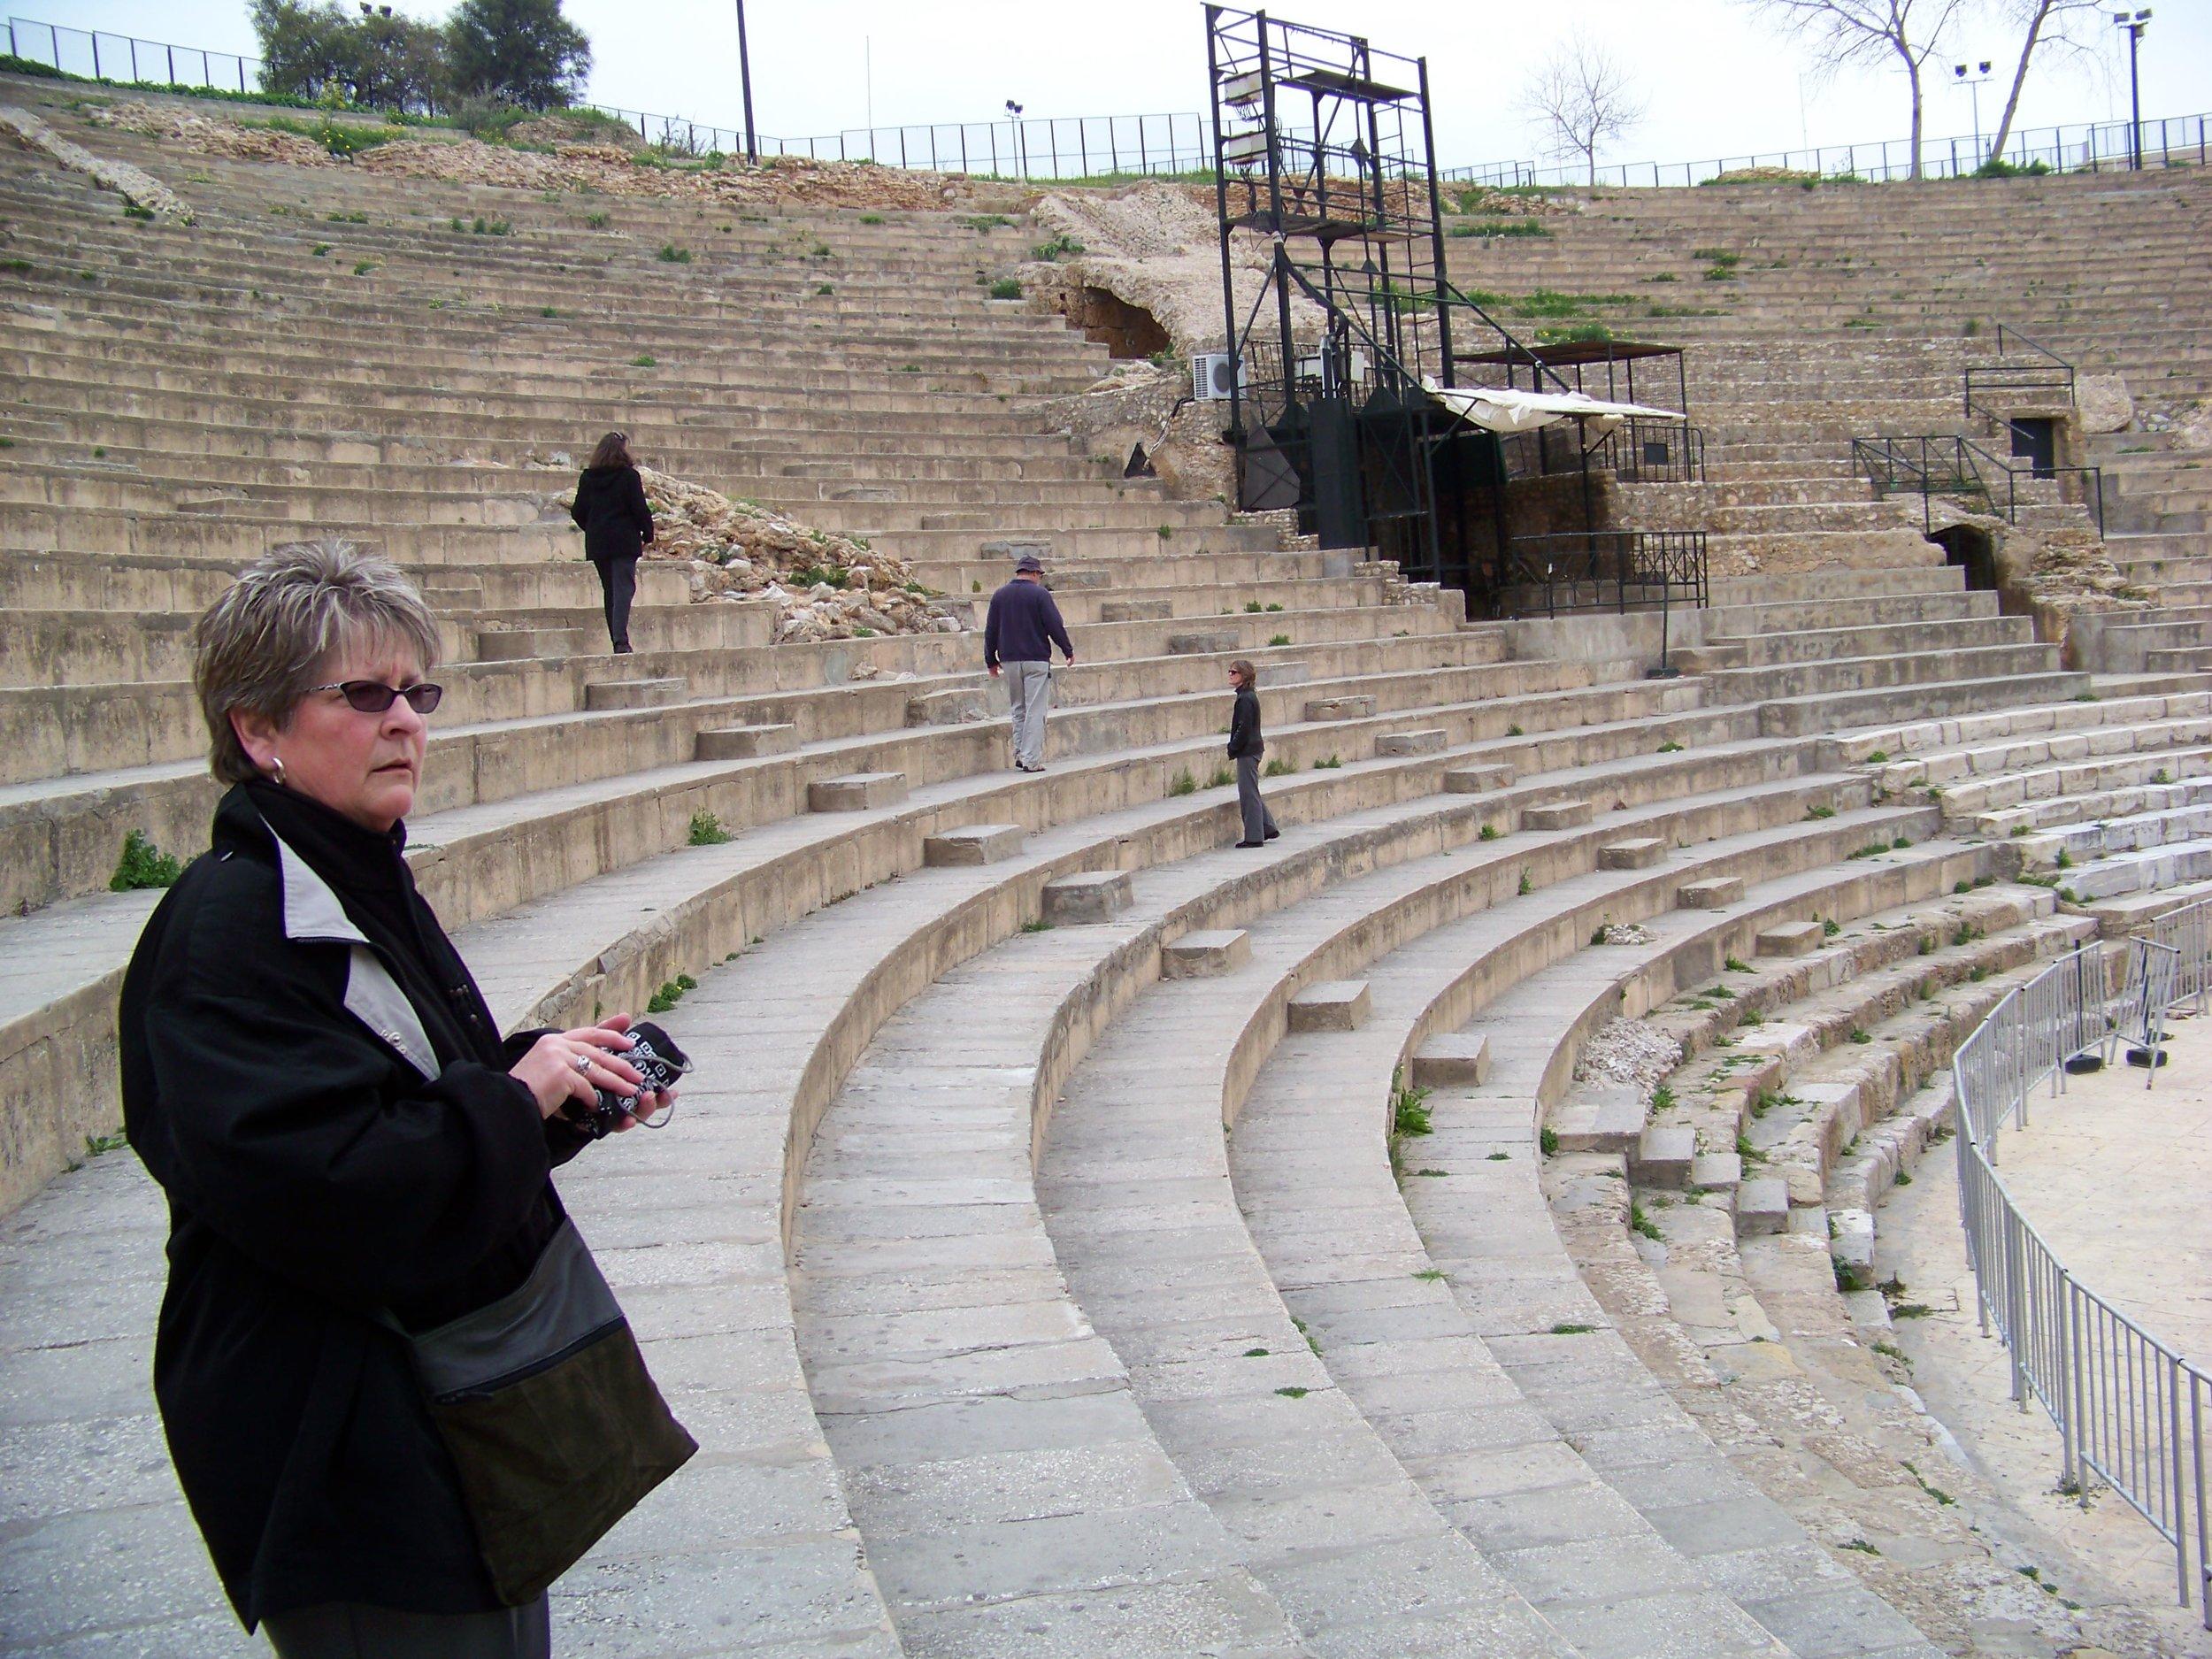 100_0336 ampitheater in Carthage.JPG